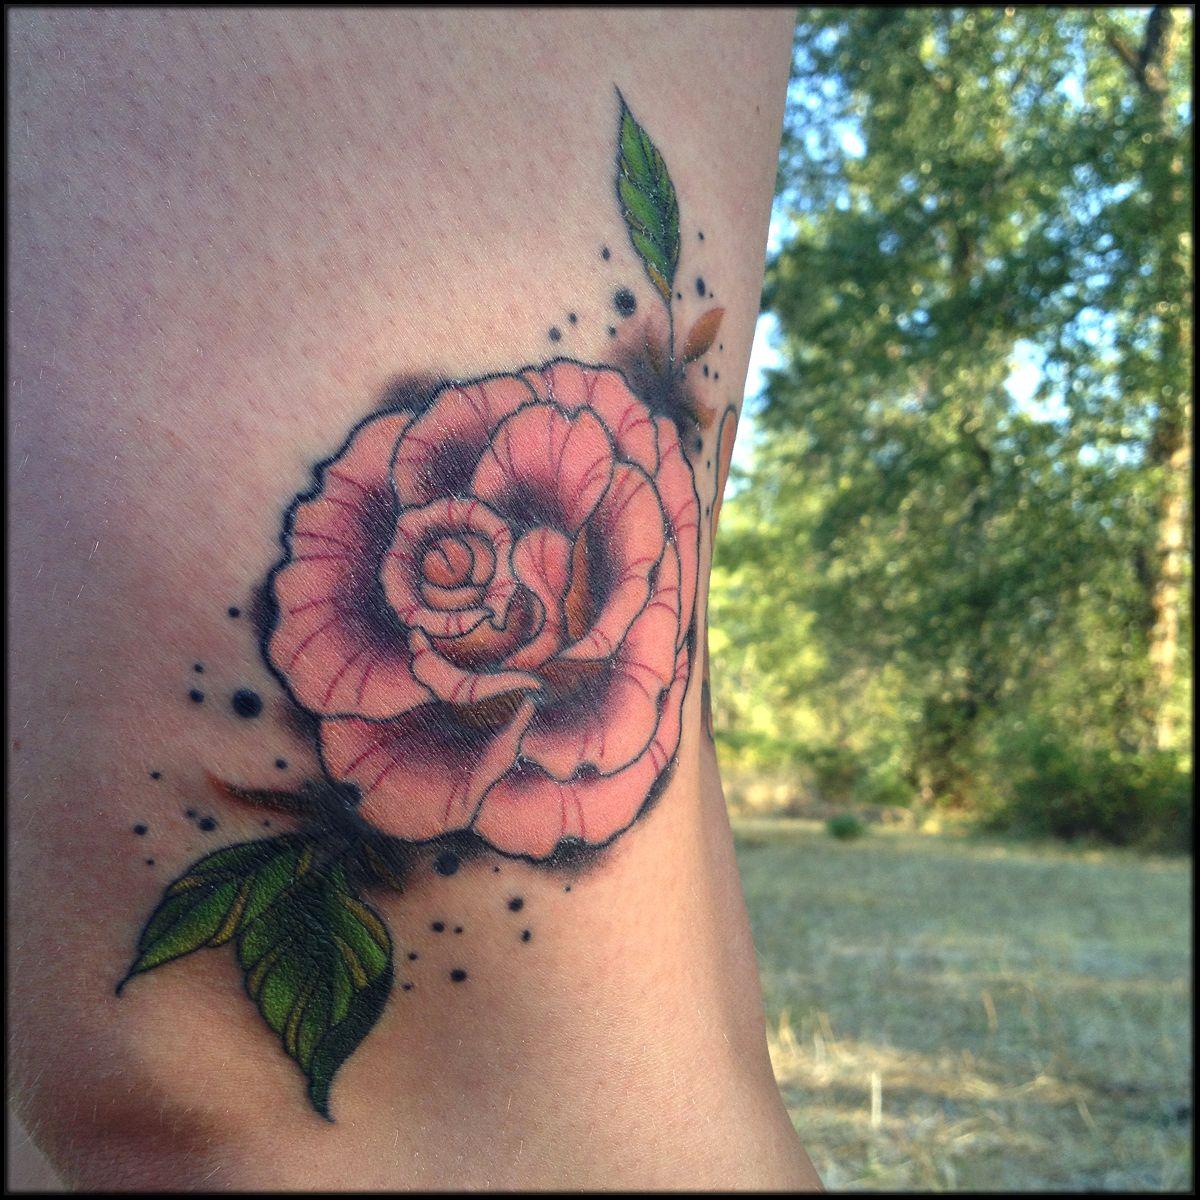 art_tattoo_rose_grants_pass_oregon.jpg